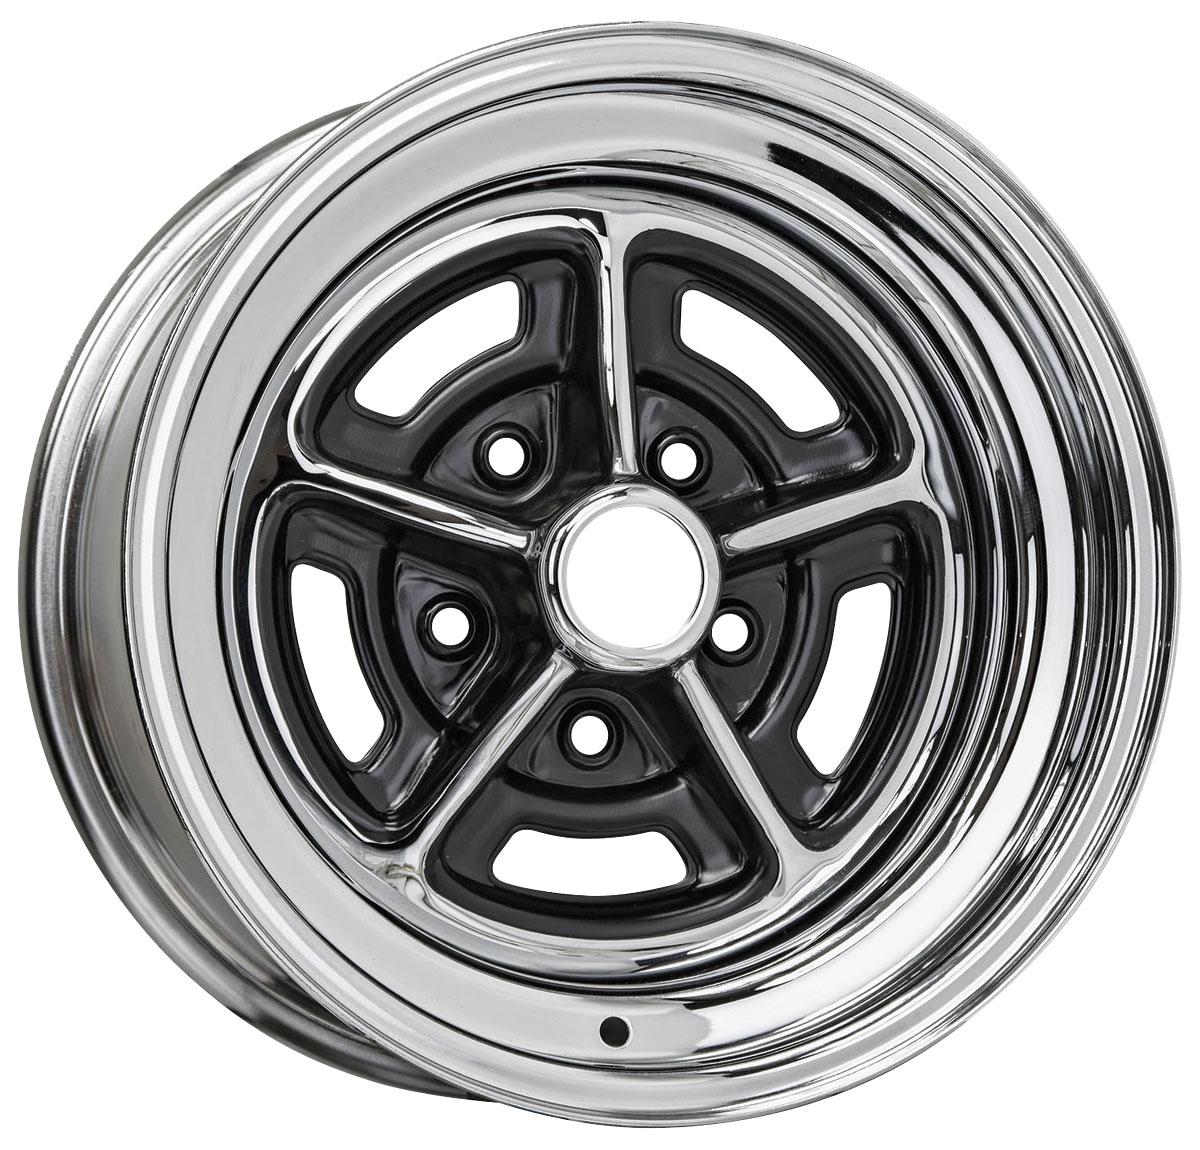 "Wheel, Buick Rally, 15X8, 4-1/2"" Back Spacing"